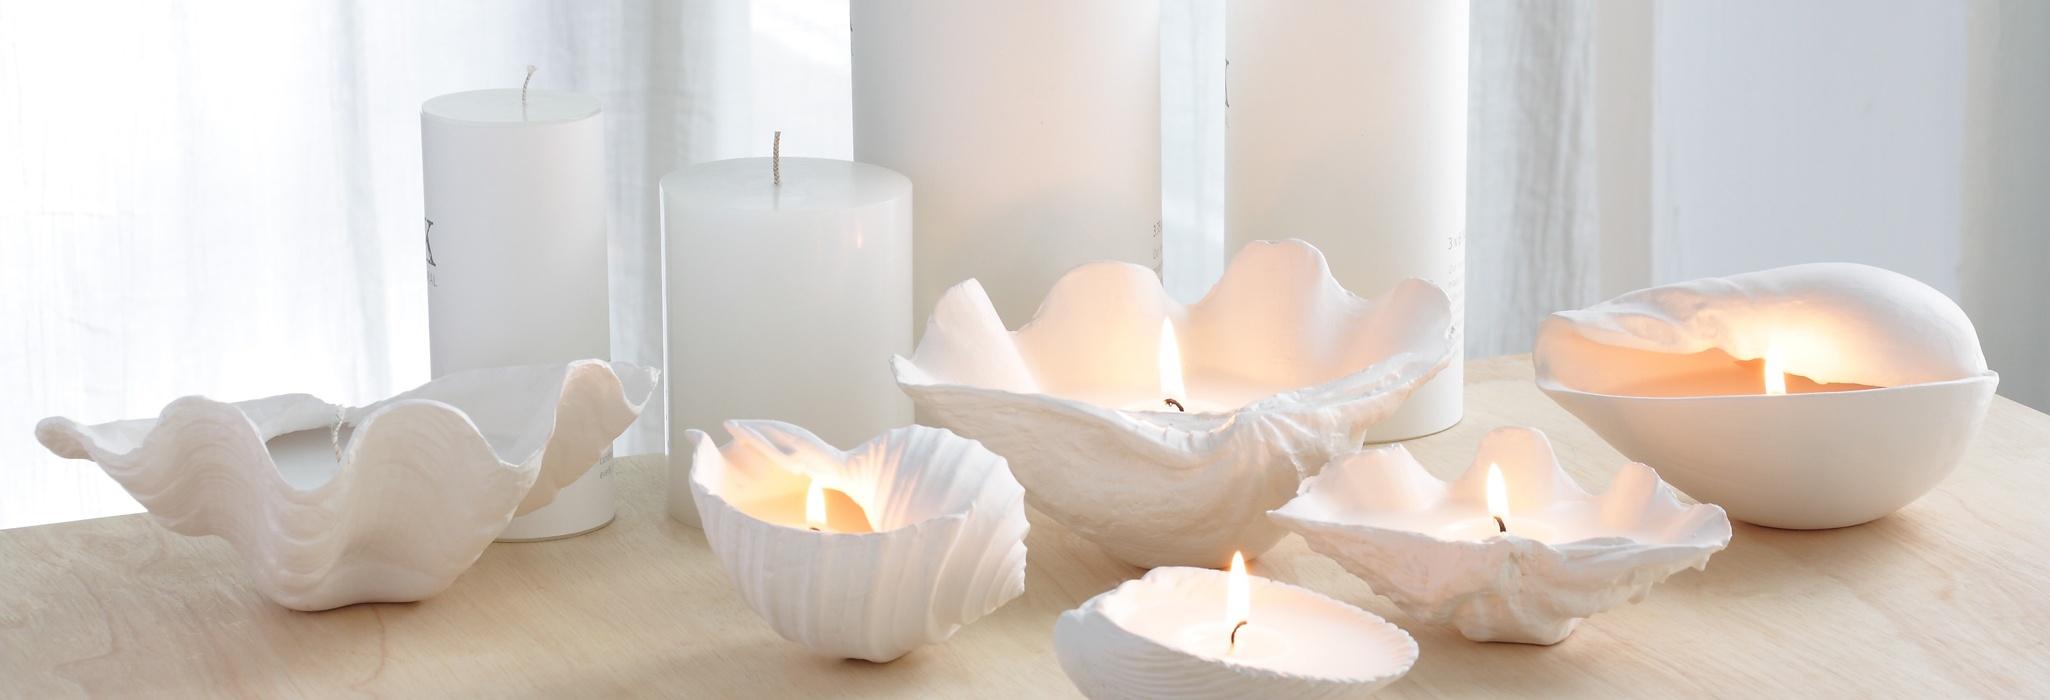 4 PCS simple candle